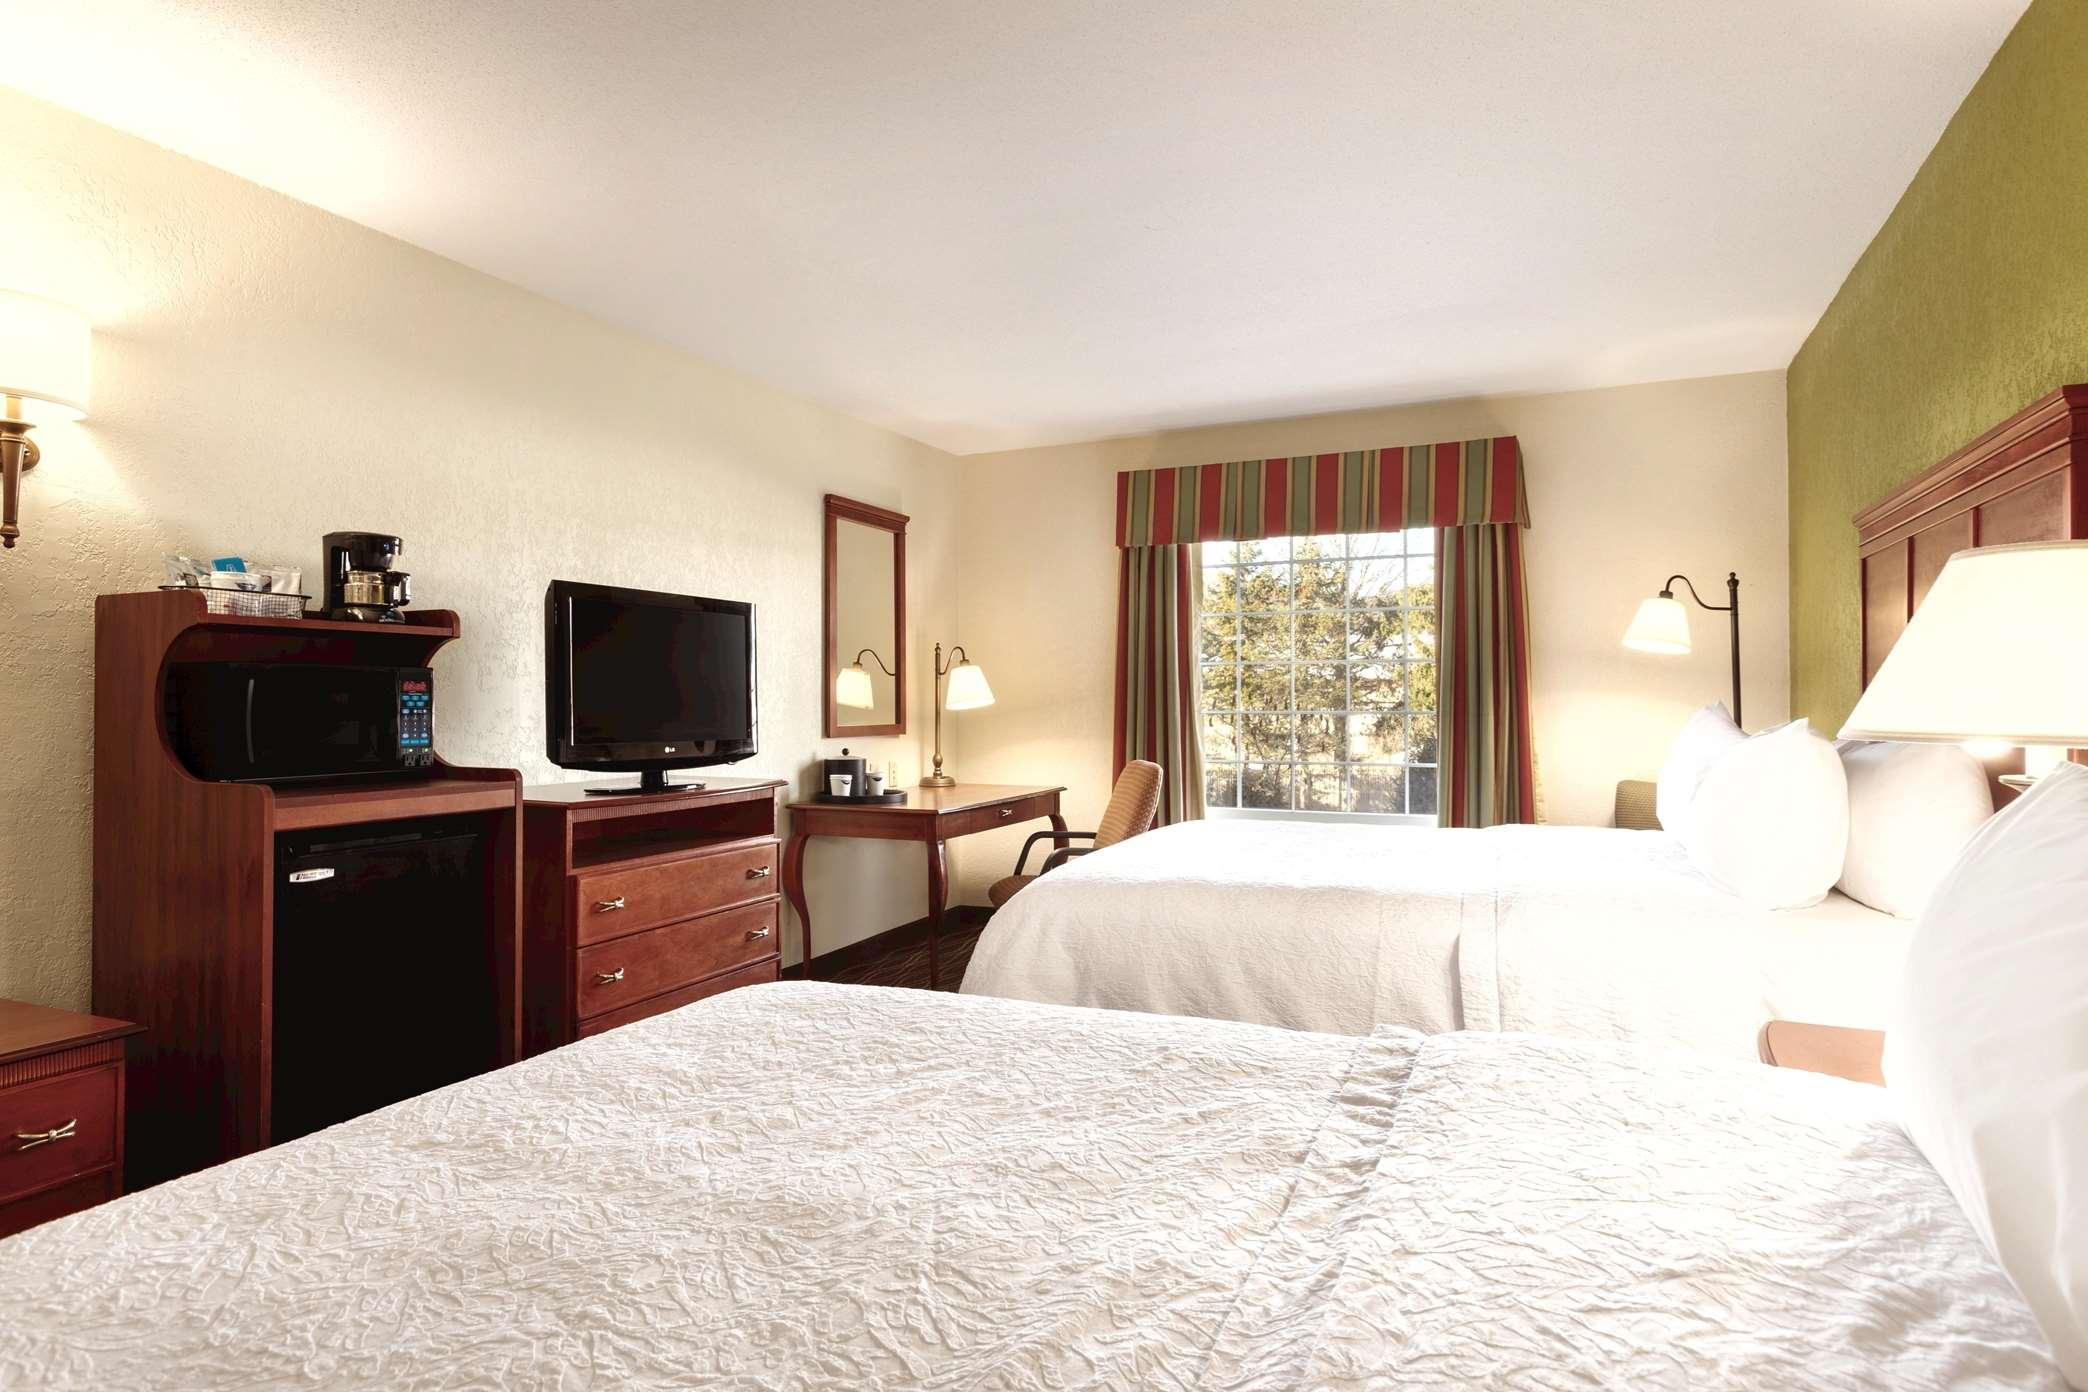 Hampton Inn & Suites Greenfield image 37